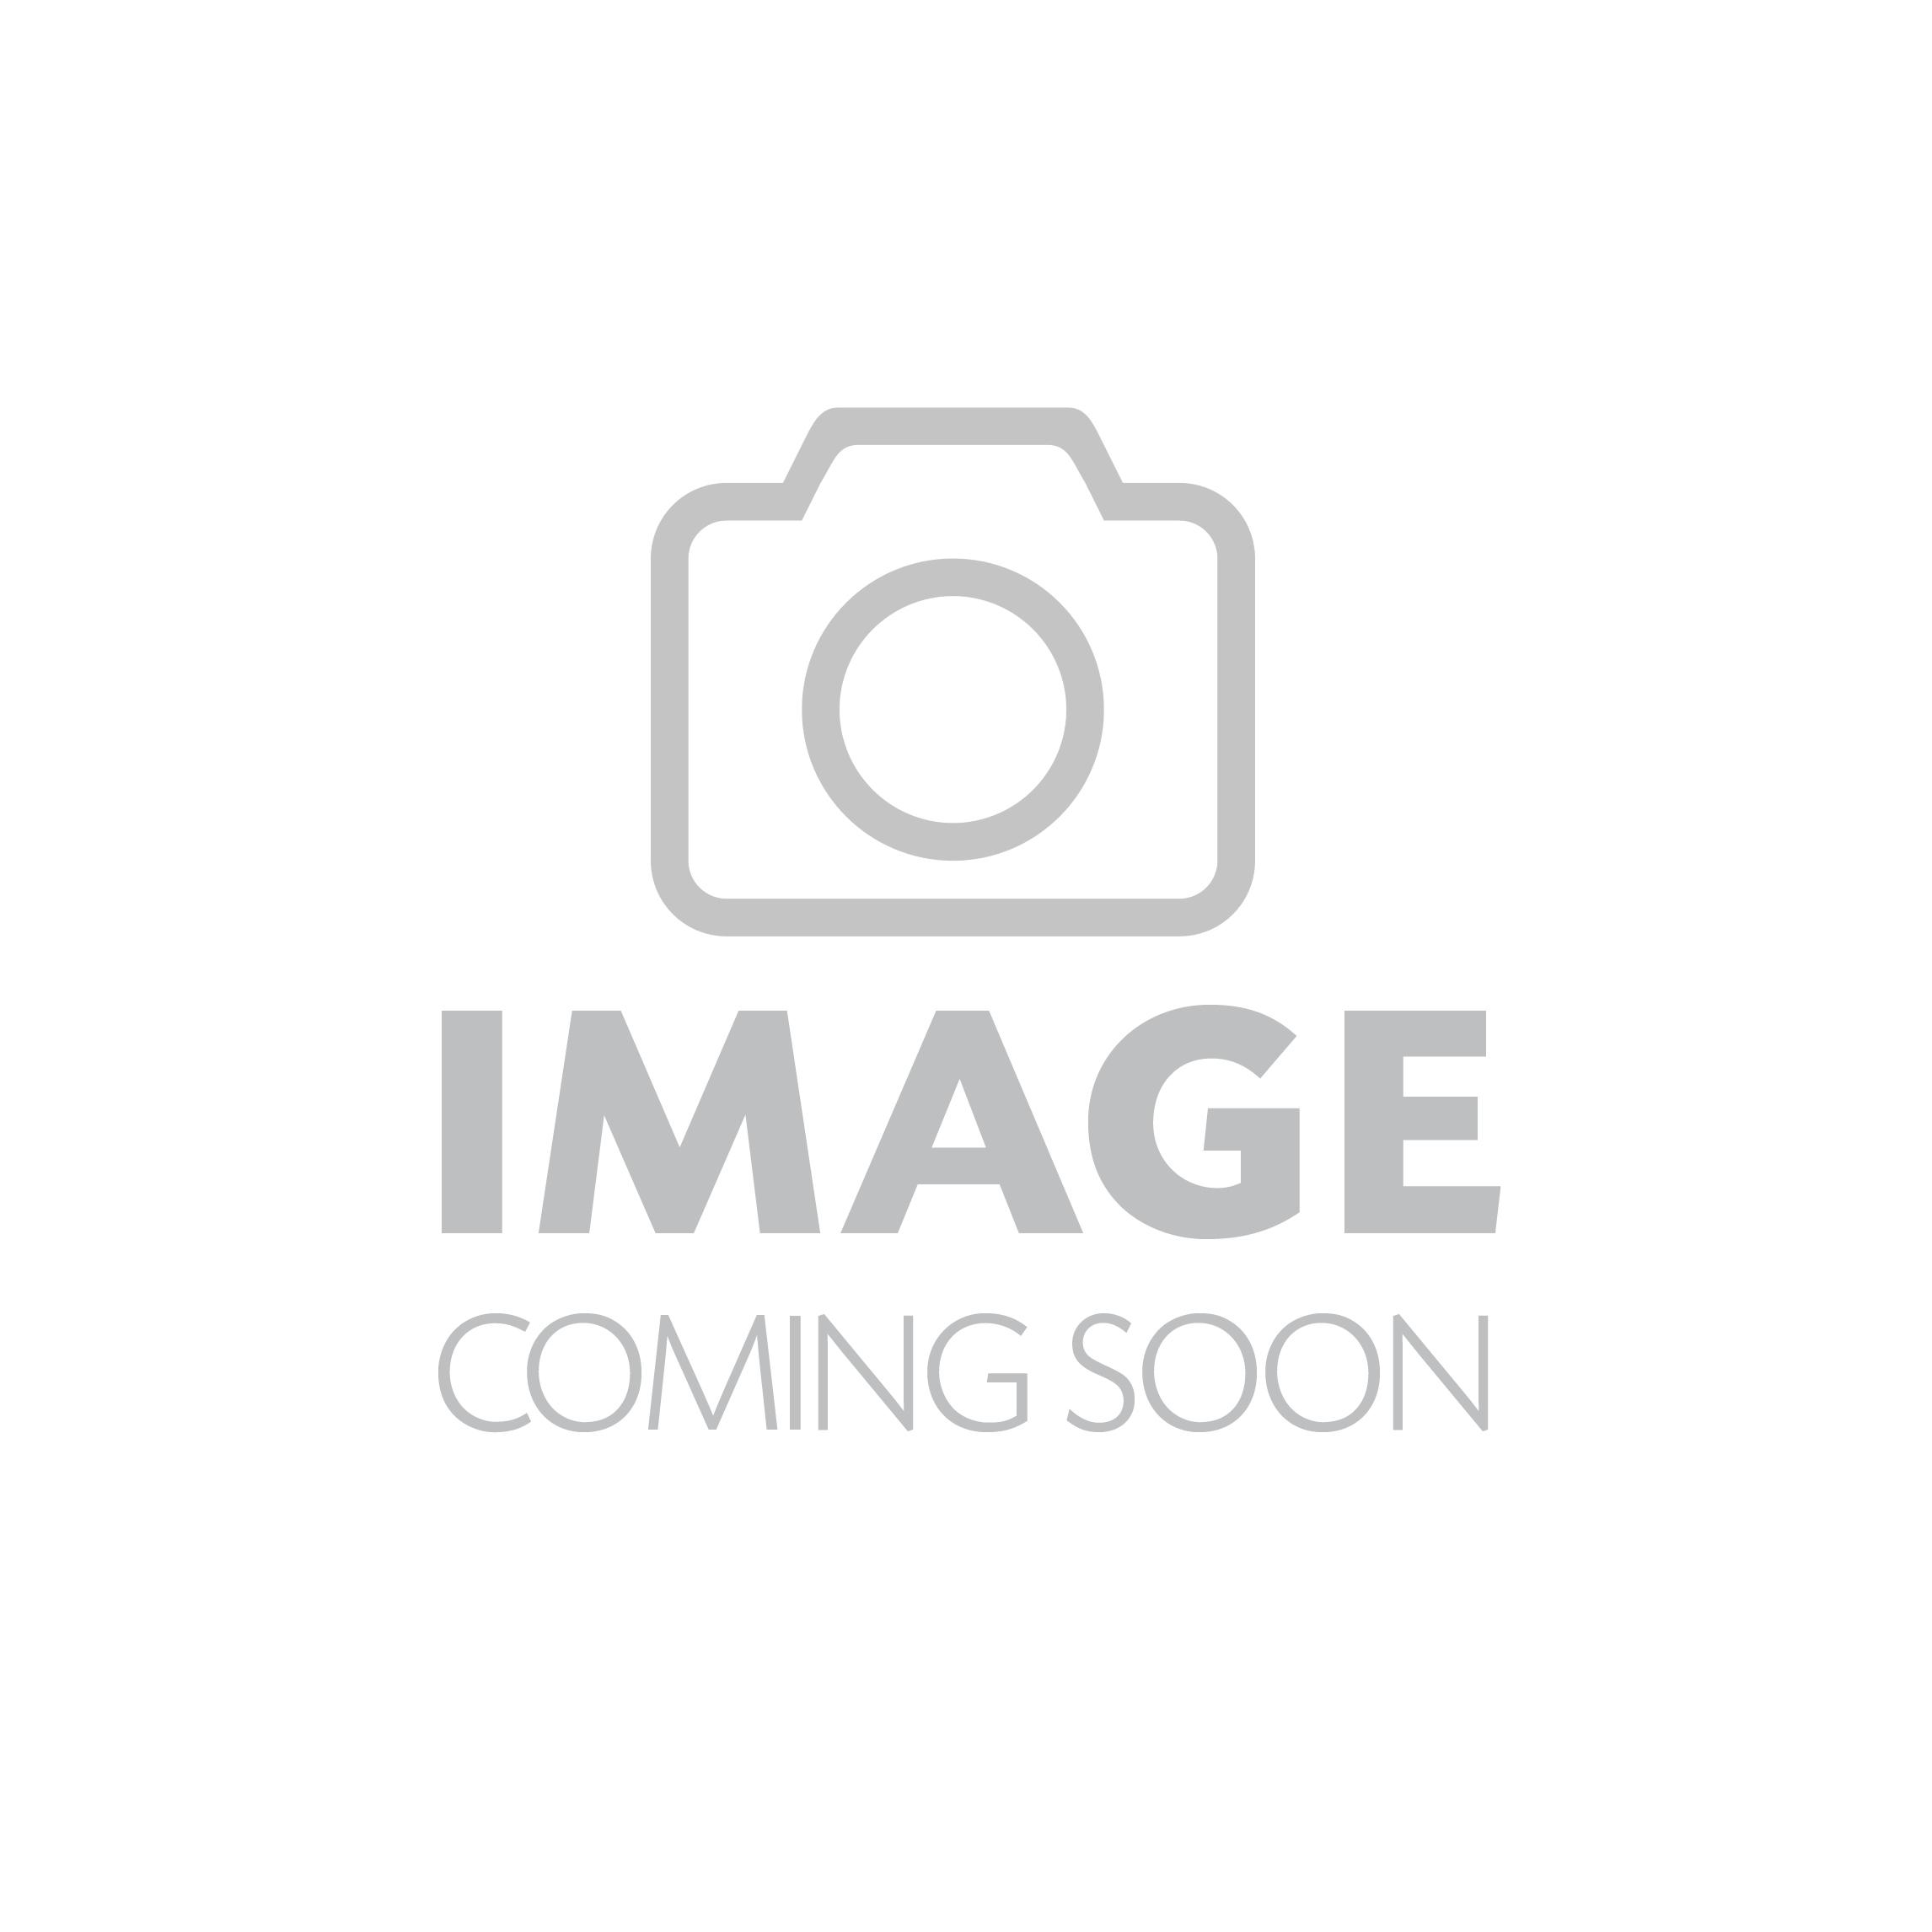 Vokera Evolve 32C Combi Boiler Pack